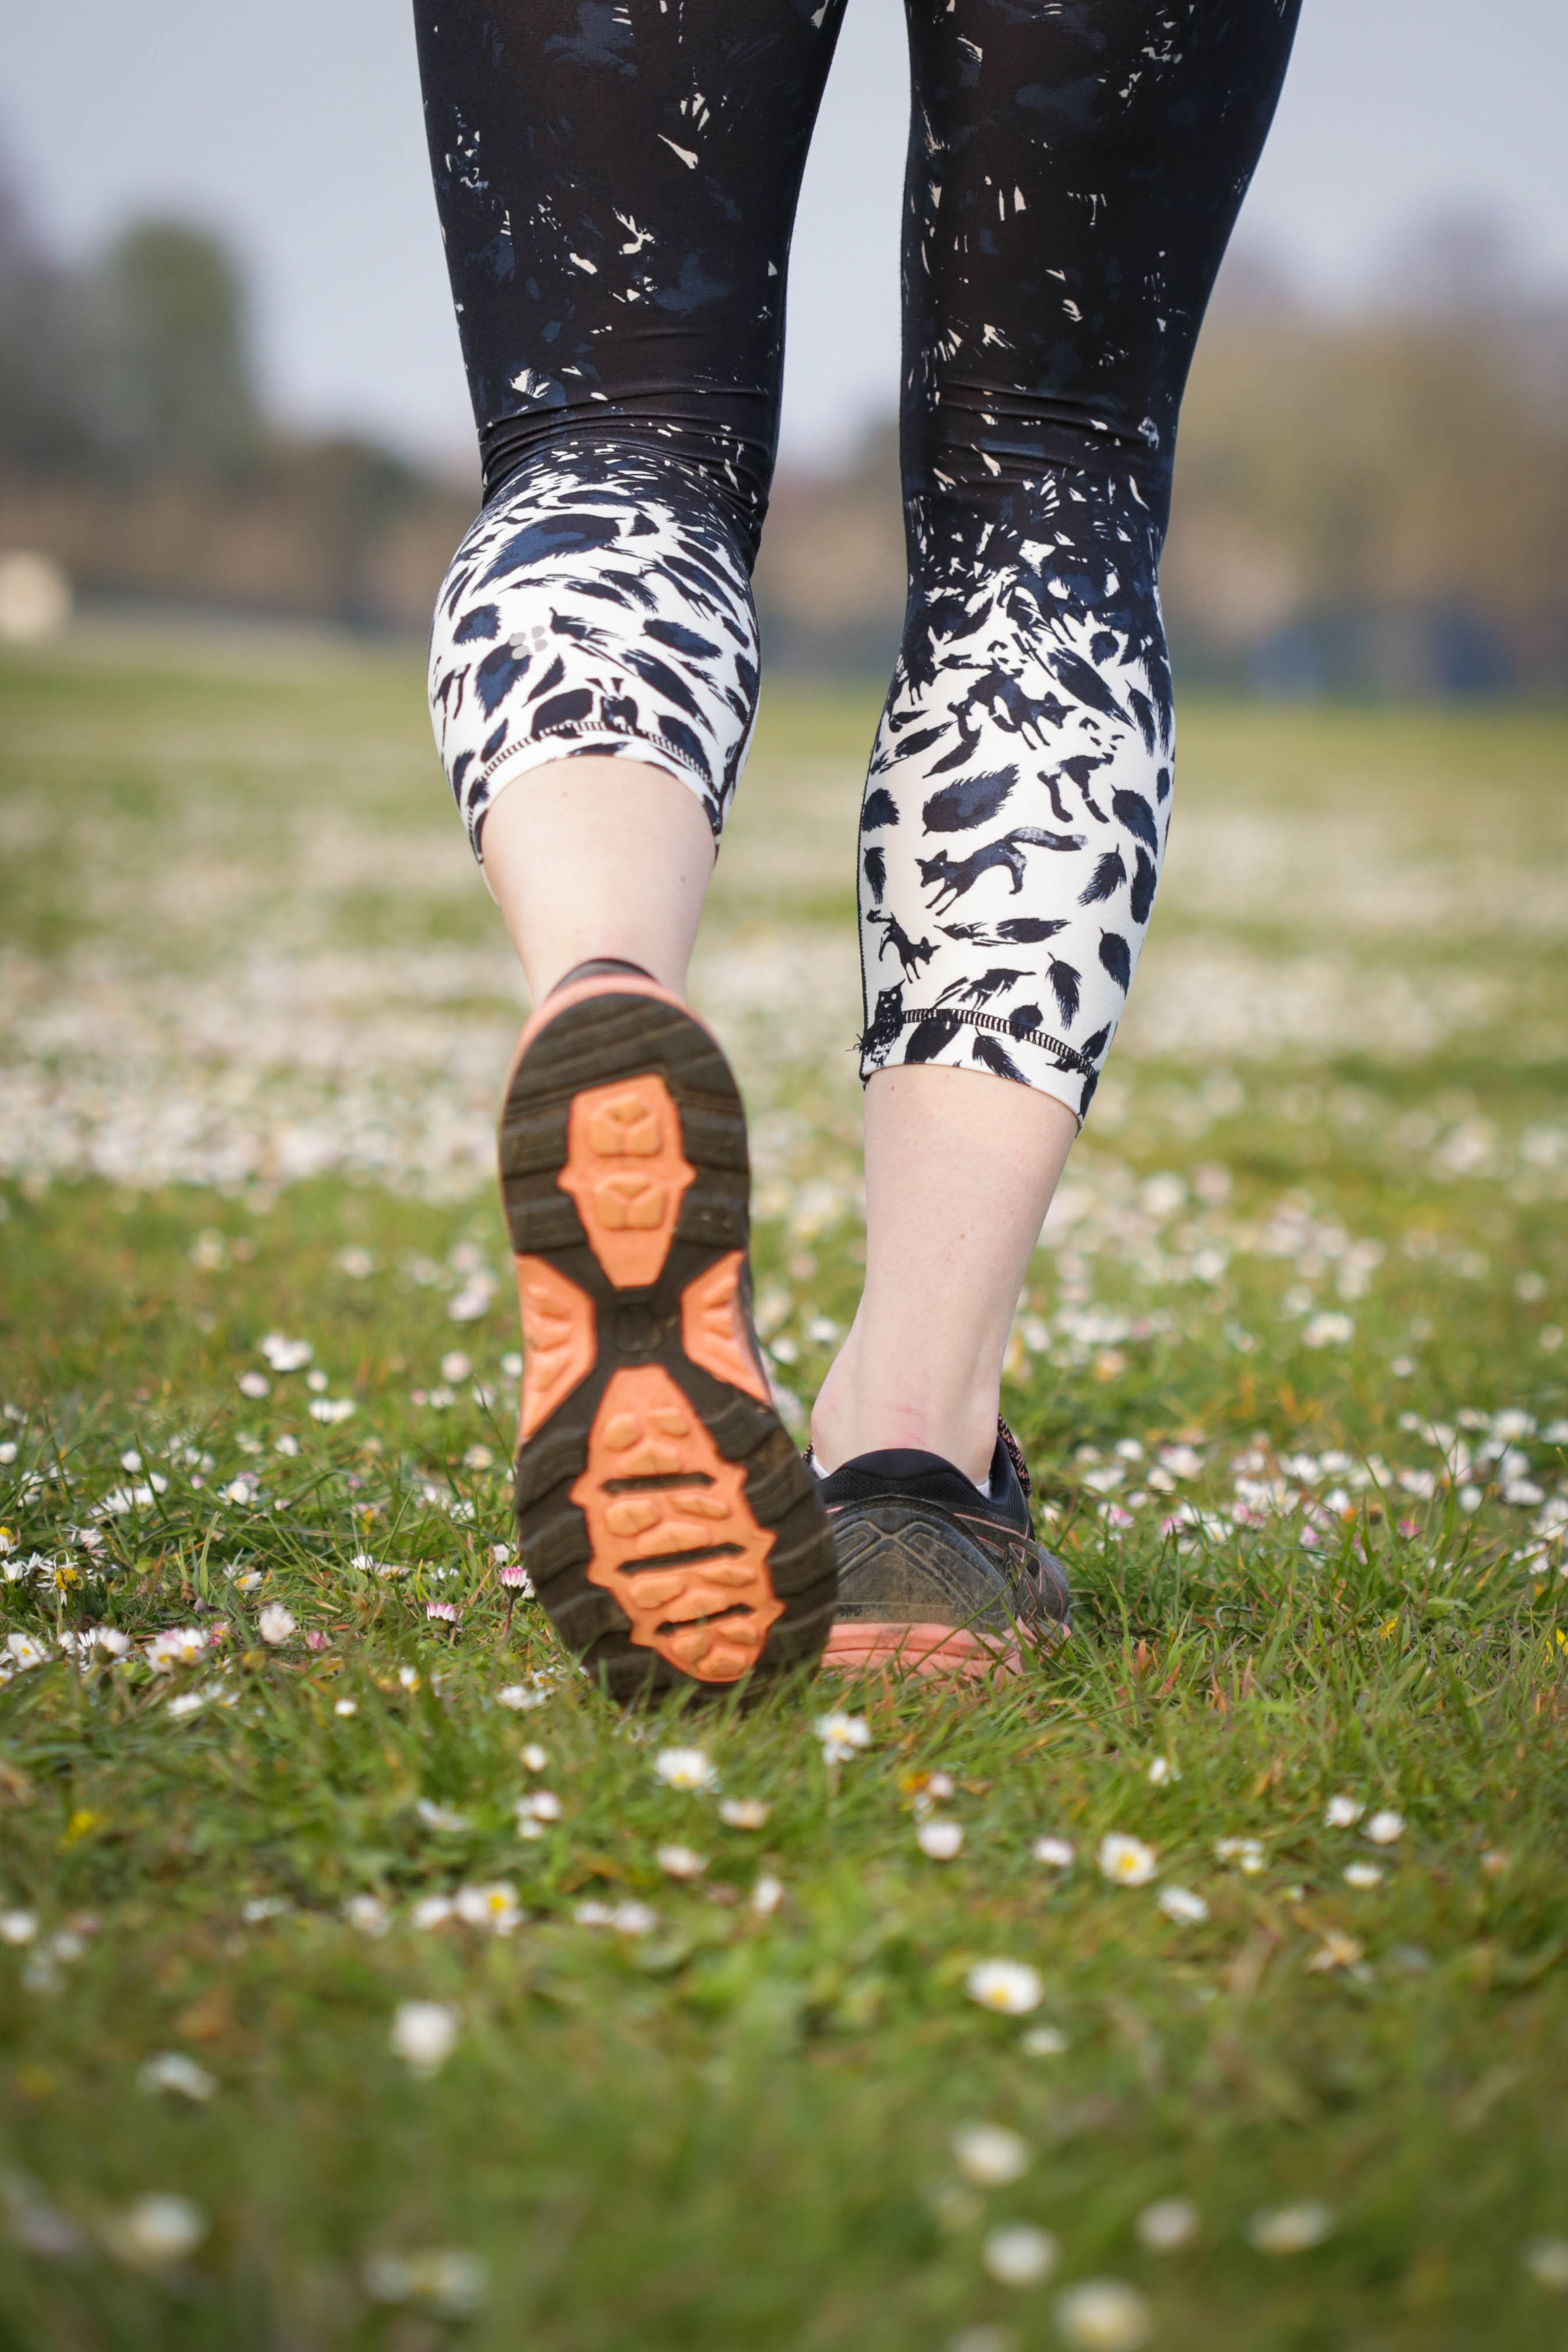 Cancer fitness training: 10 x 30 mins